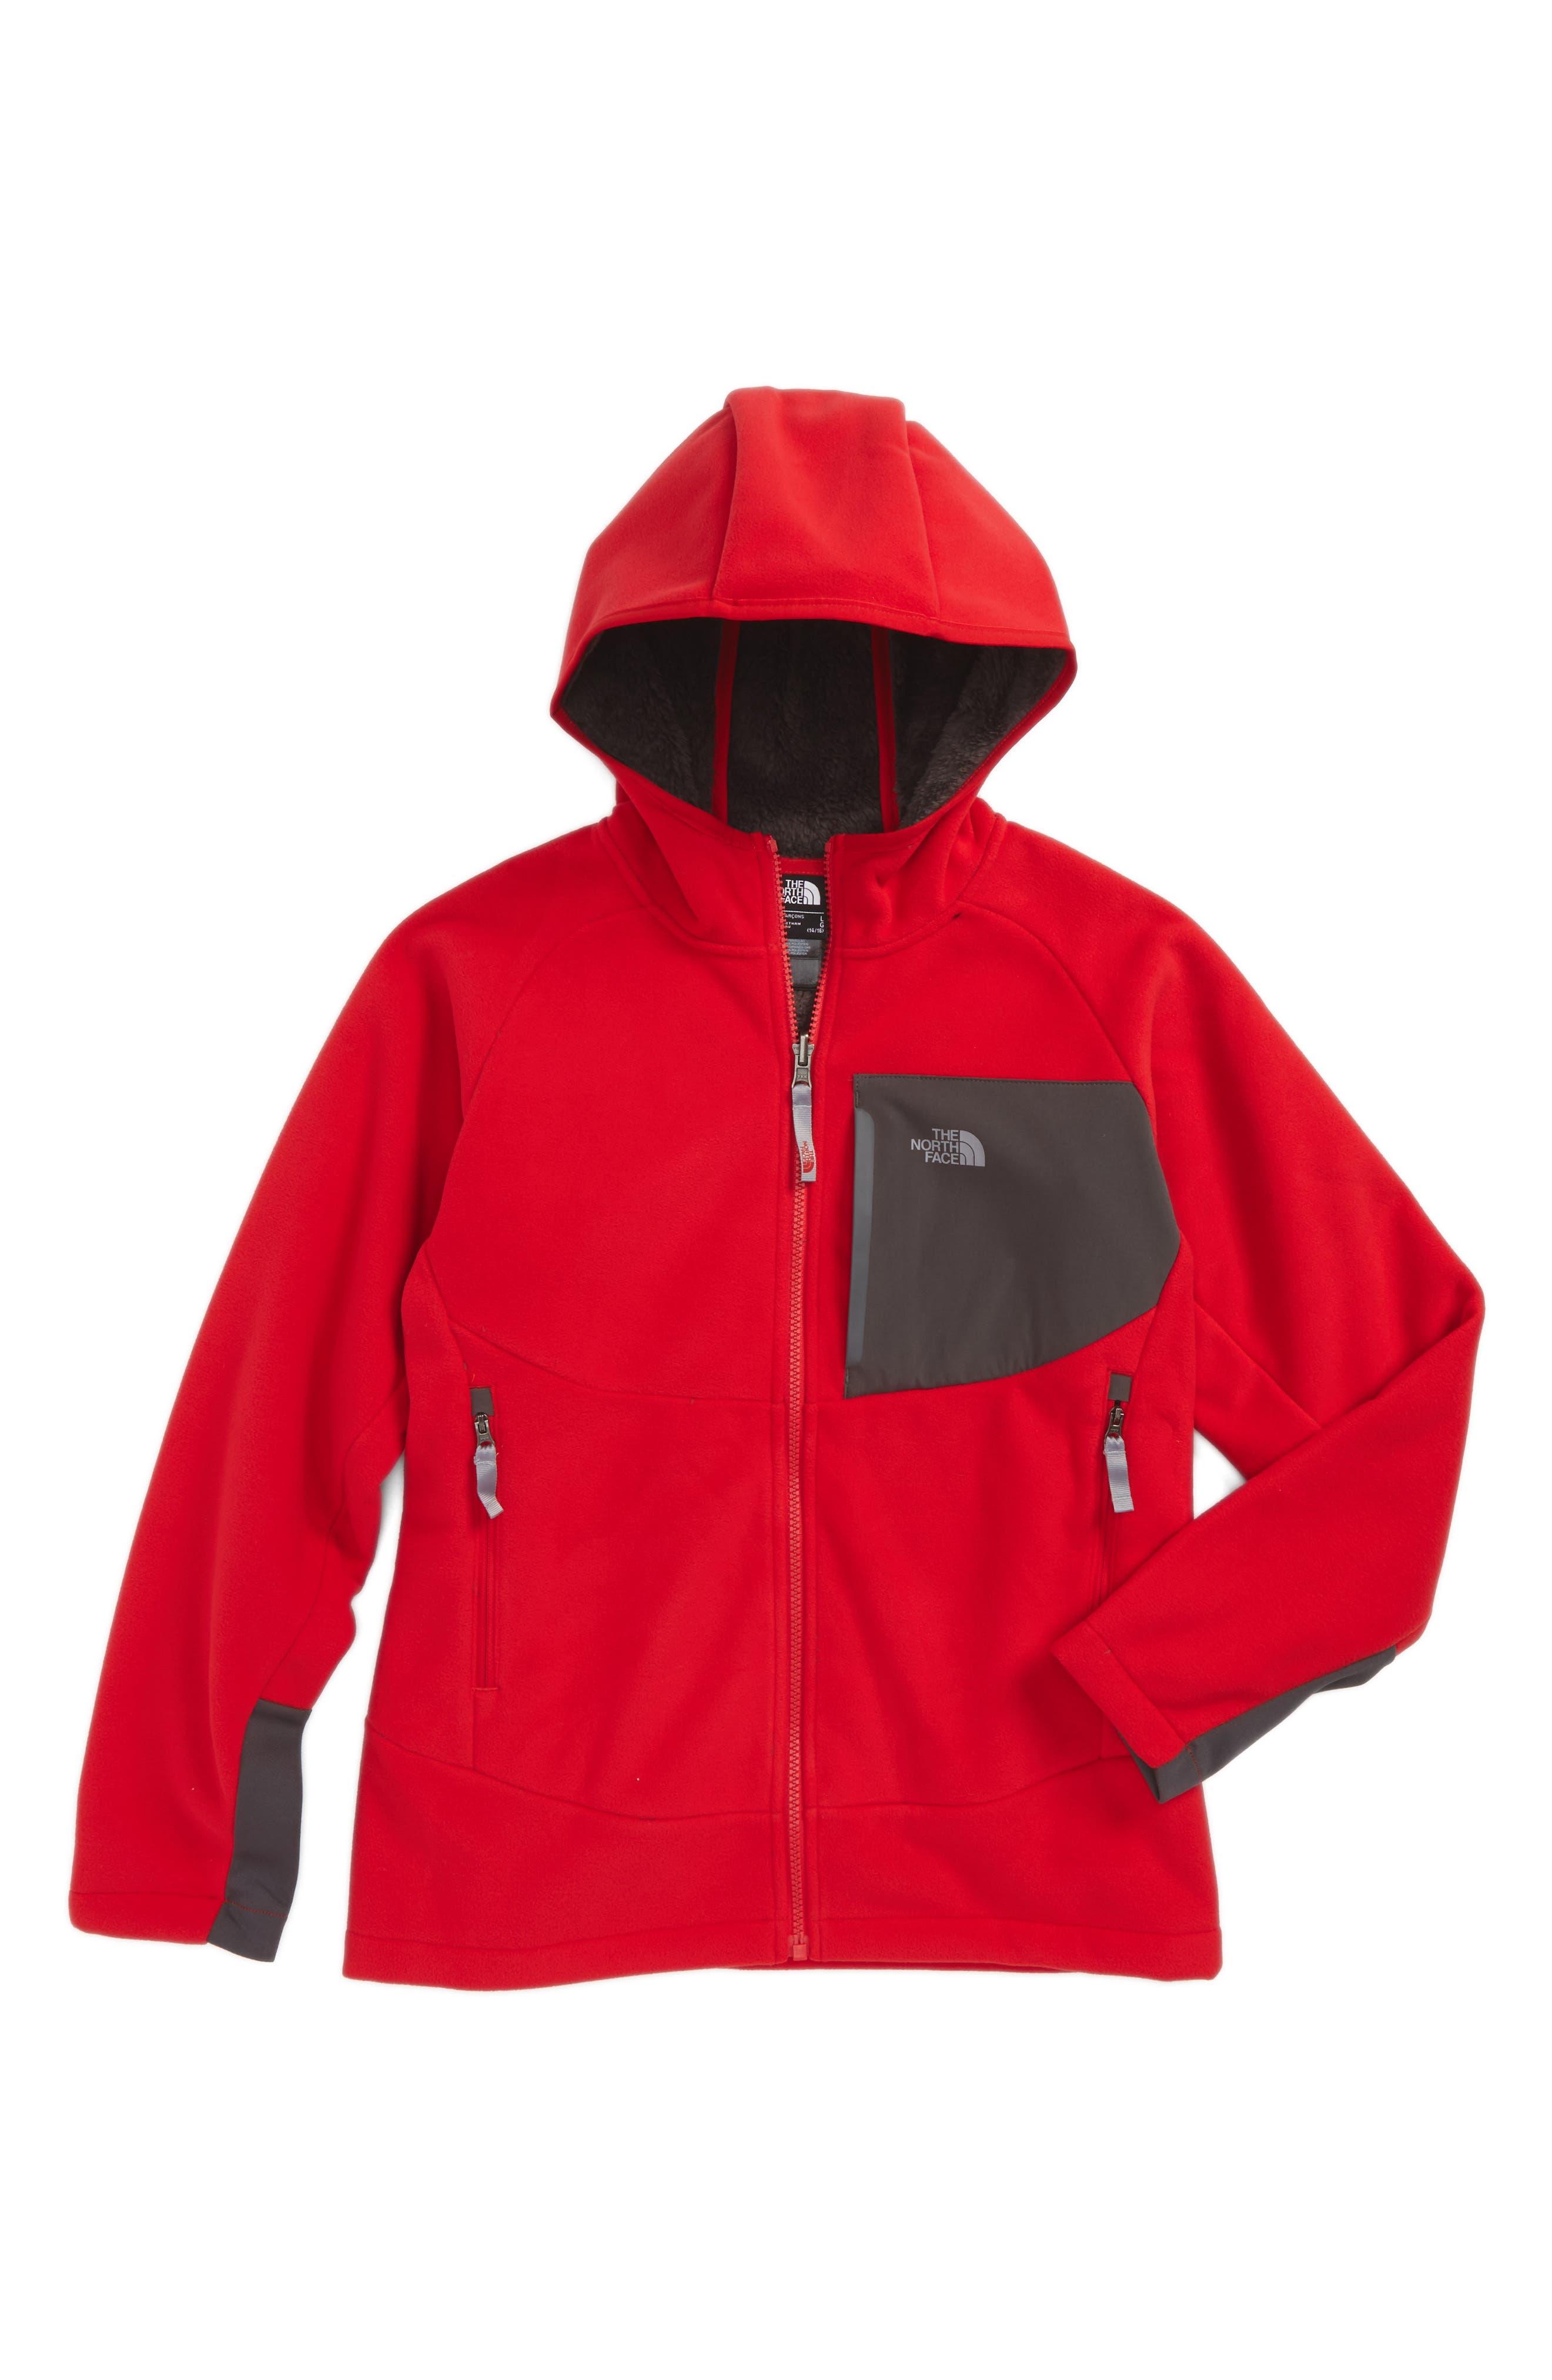 'Chimborazo' Hoodie,                         Main,                         color, TNF RED/ GRAPHITE GREY